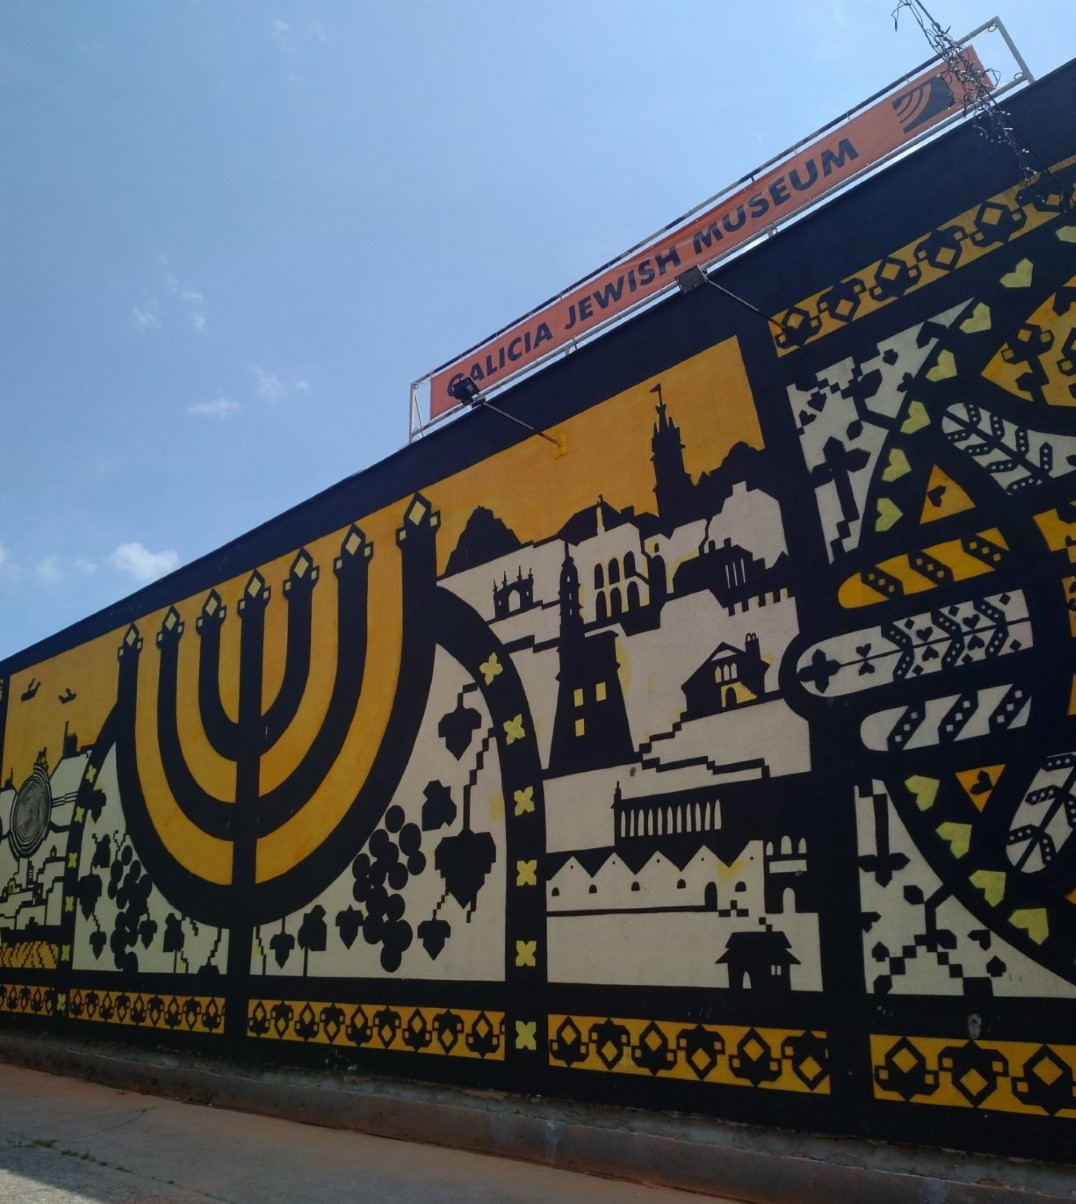 Galicia Jewish Museum - Krakow street art